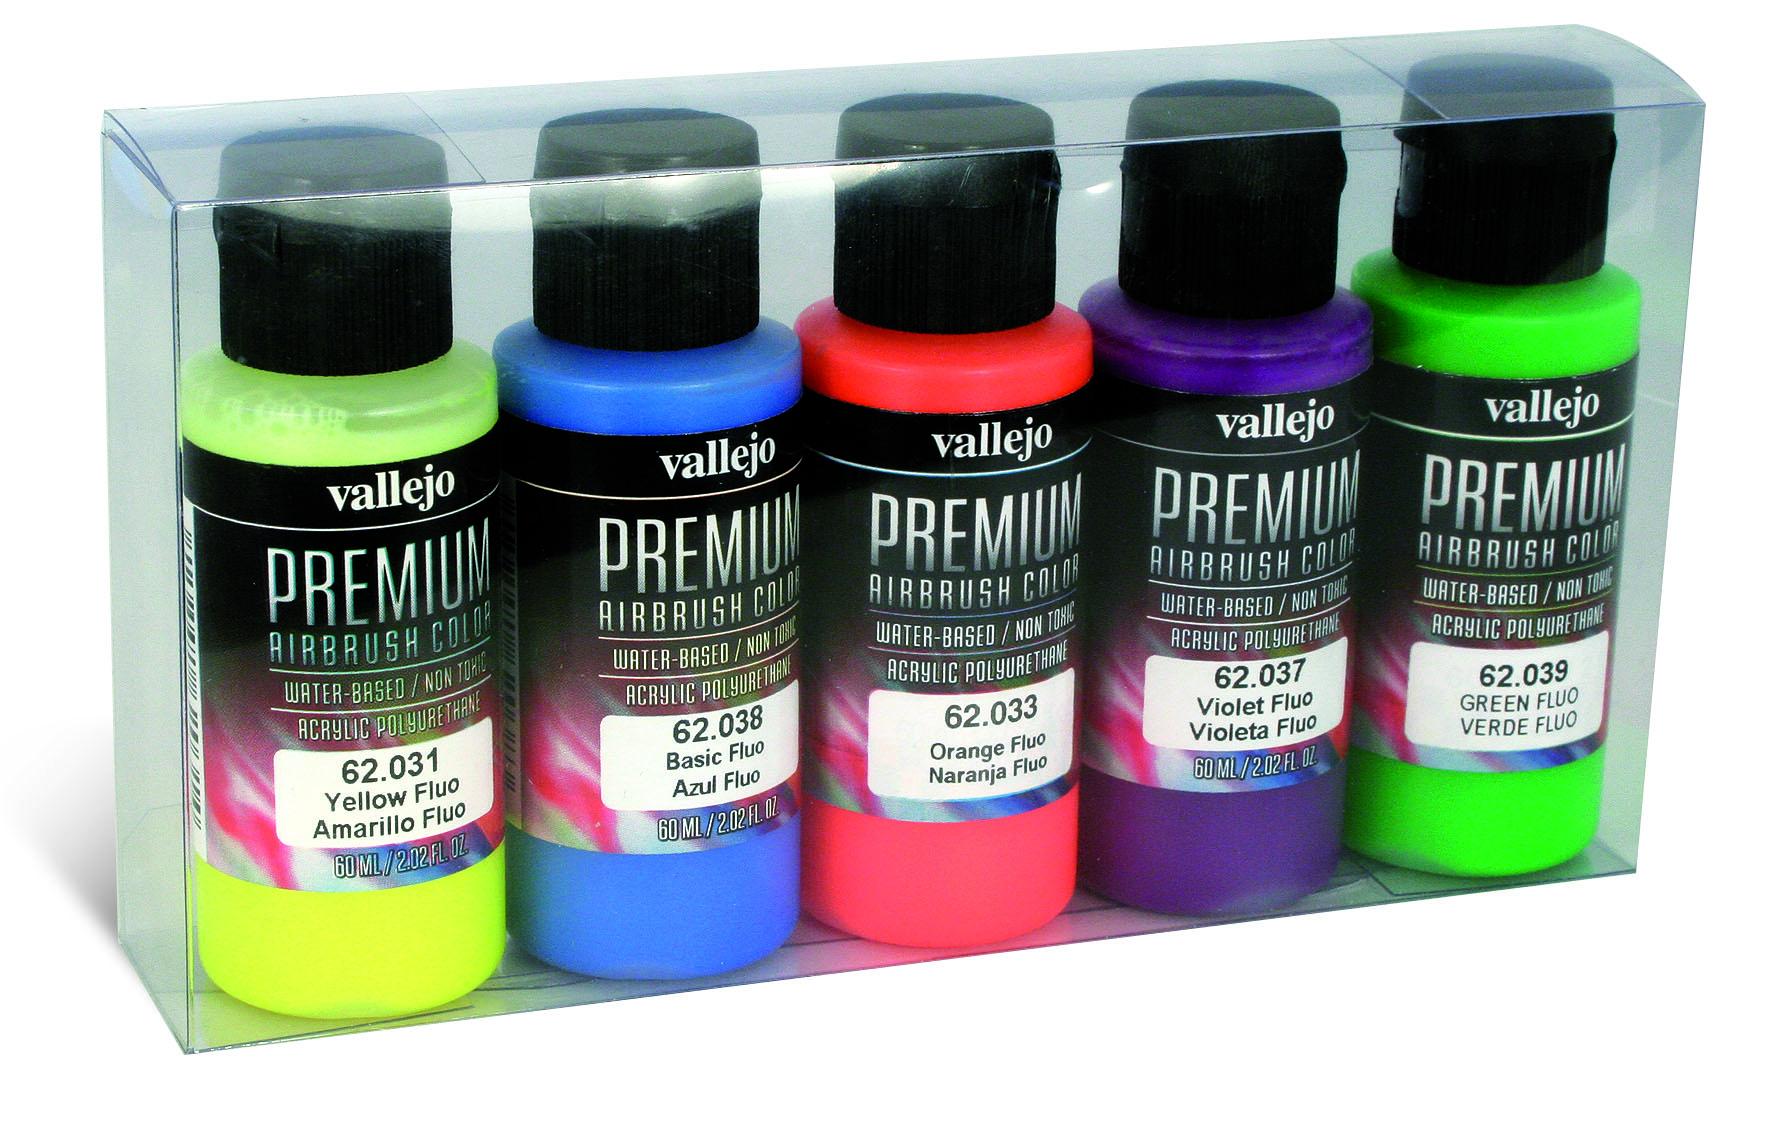 Premium Color 5 Color Set Vallejo 62102 Premium Fluo Color 5x 60ml Airbrush Farbe